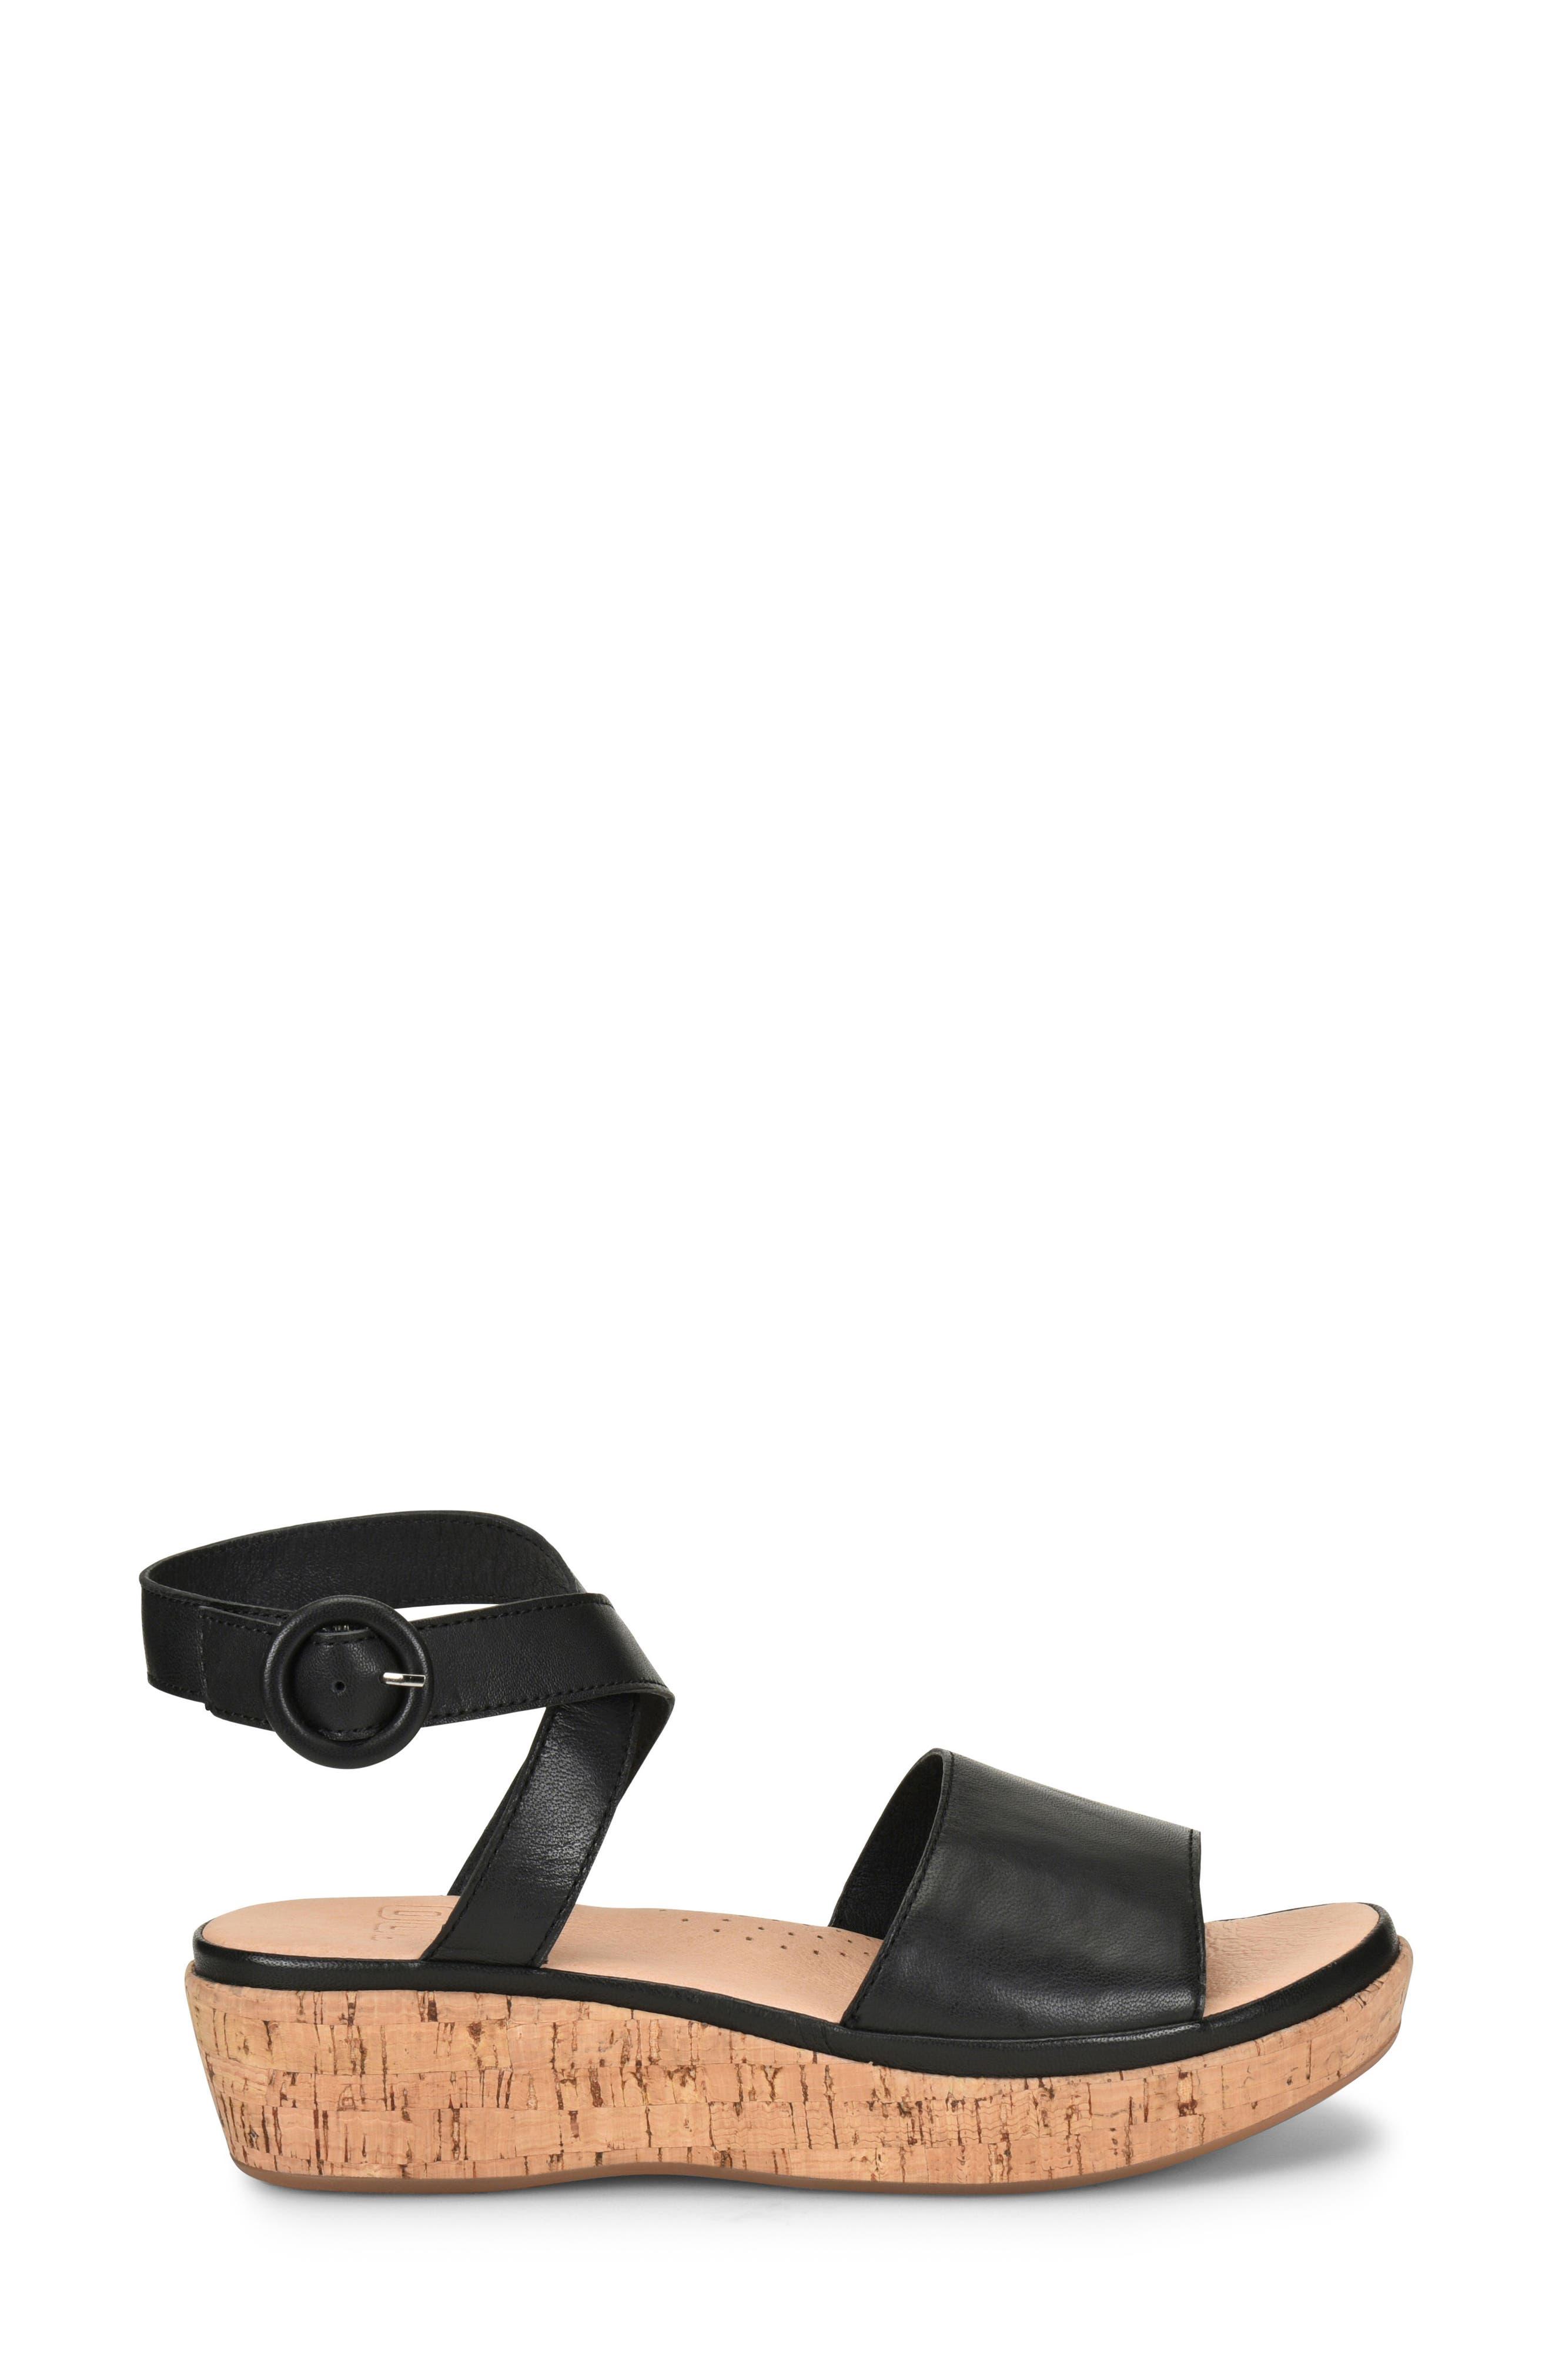 ONO, Dreamy Platform Wedge Sandal, Alternate thumbnail 3, color, BLACK LEATHER